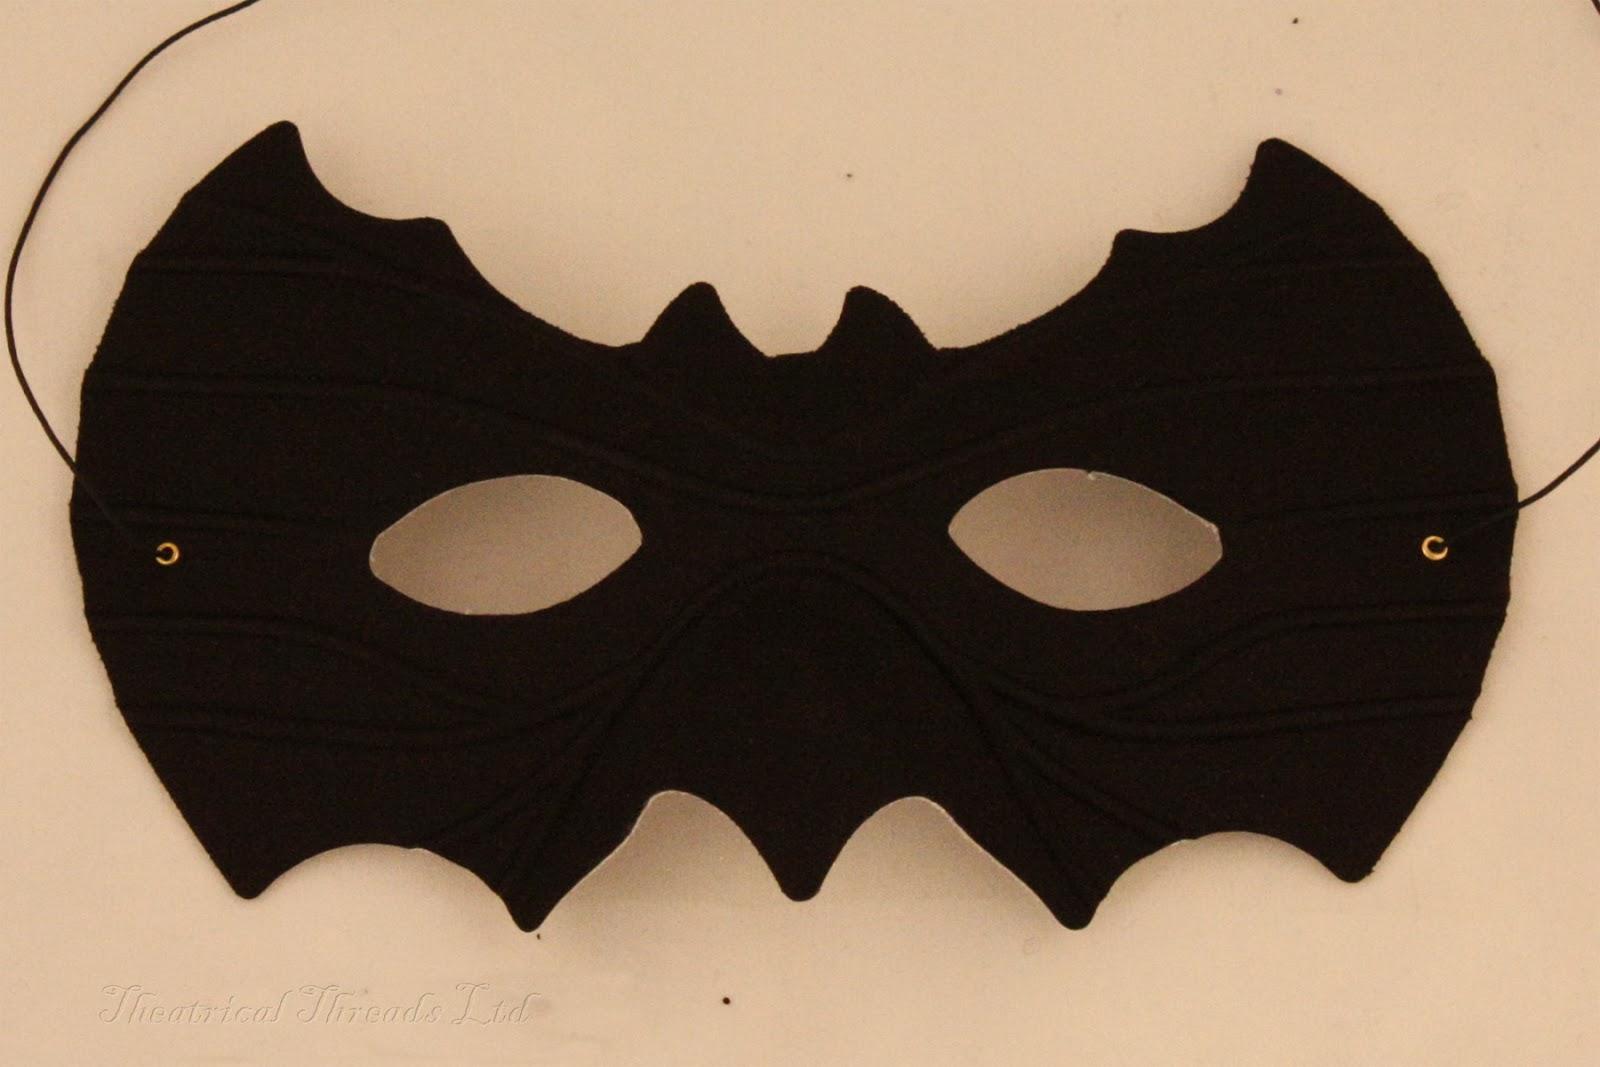 1a07090e41c6 Pipistrello Bat Masquerade Ball Mask from Theatrical Threads Ltd